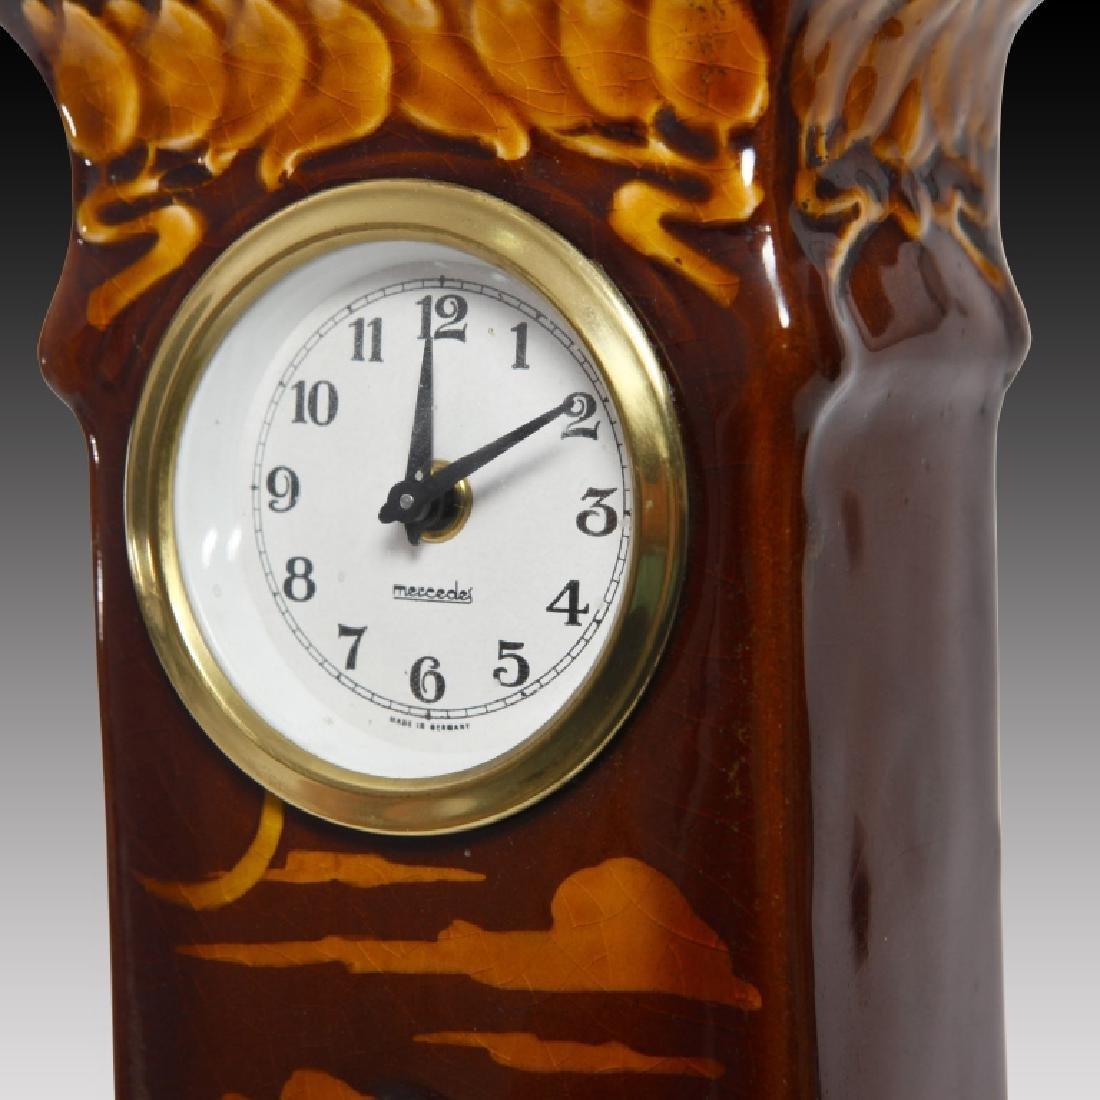 Doulton Kingsware Night Watchman Case Clock - 5